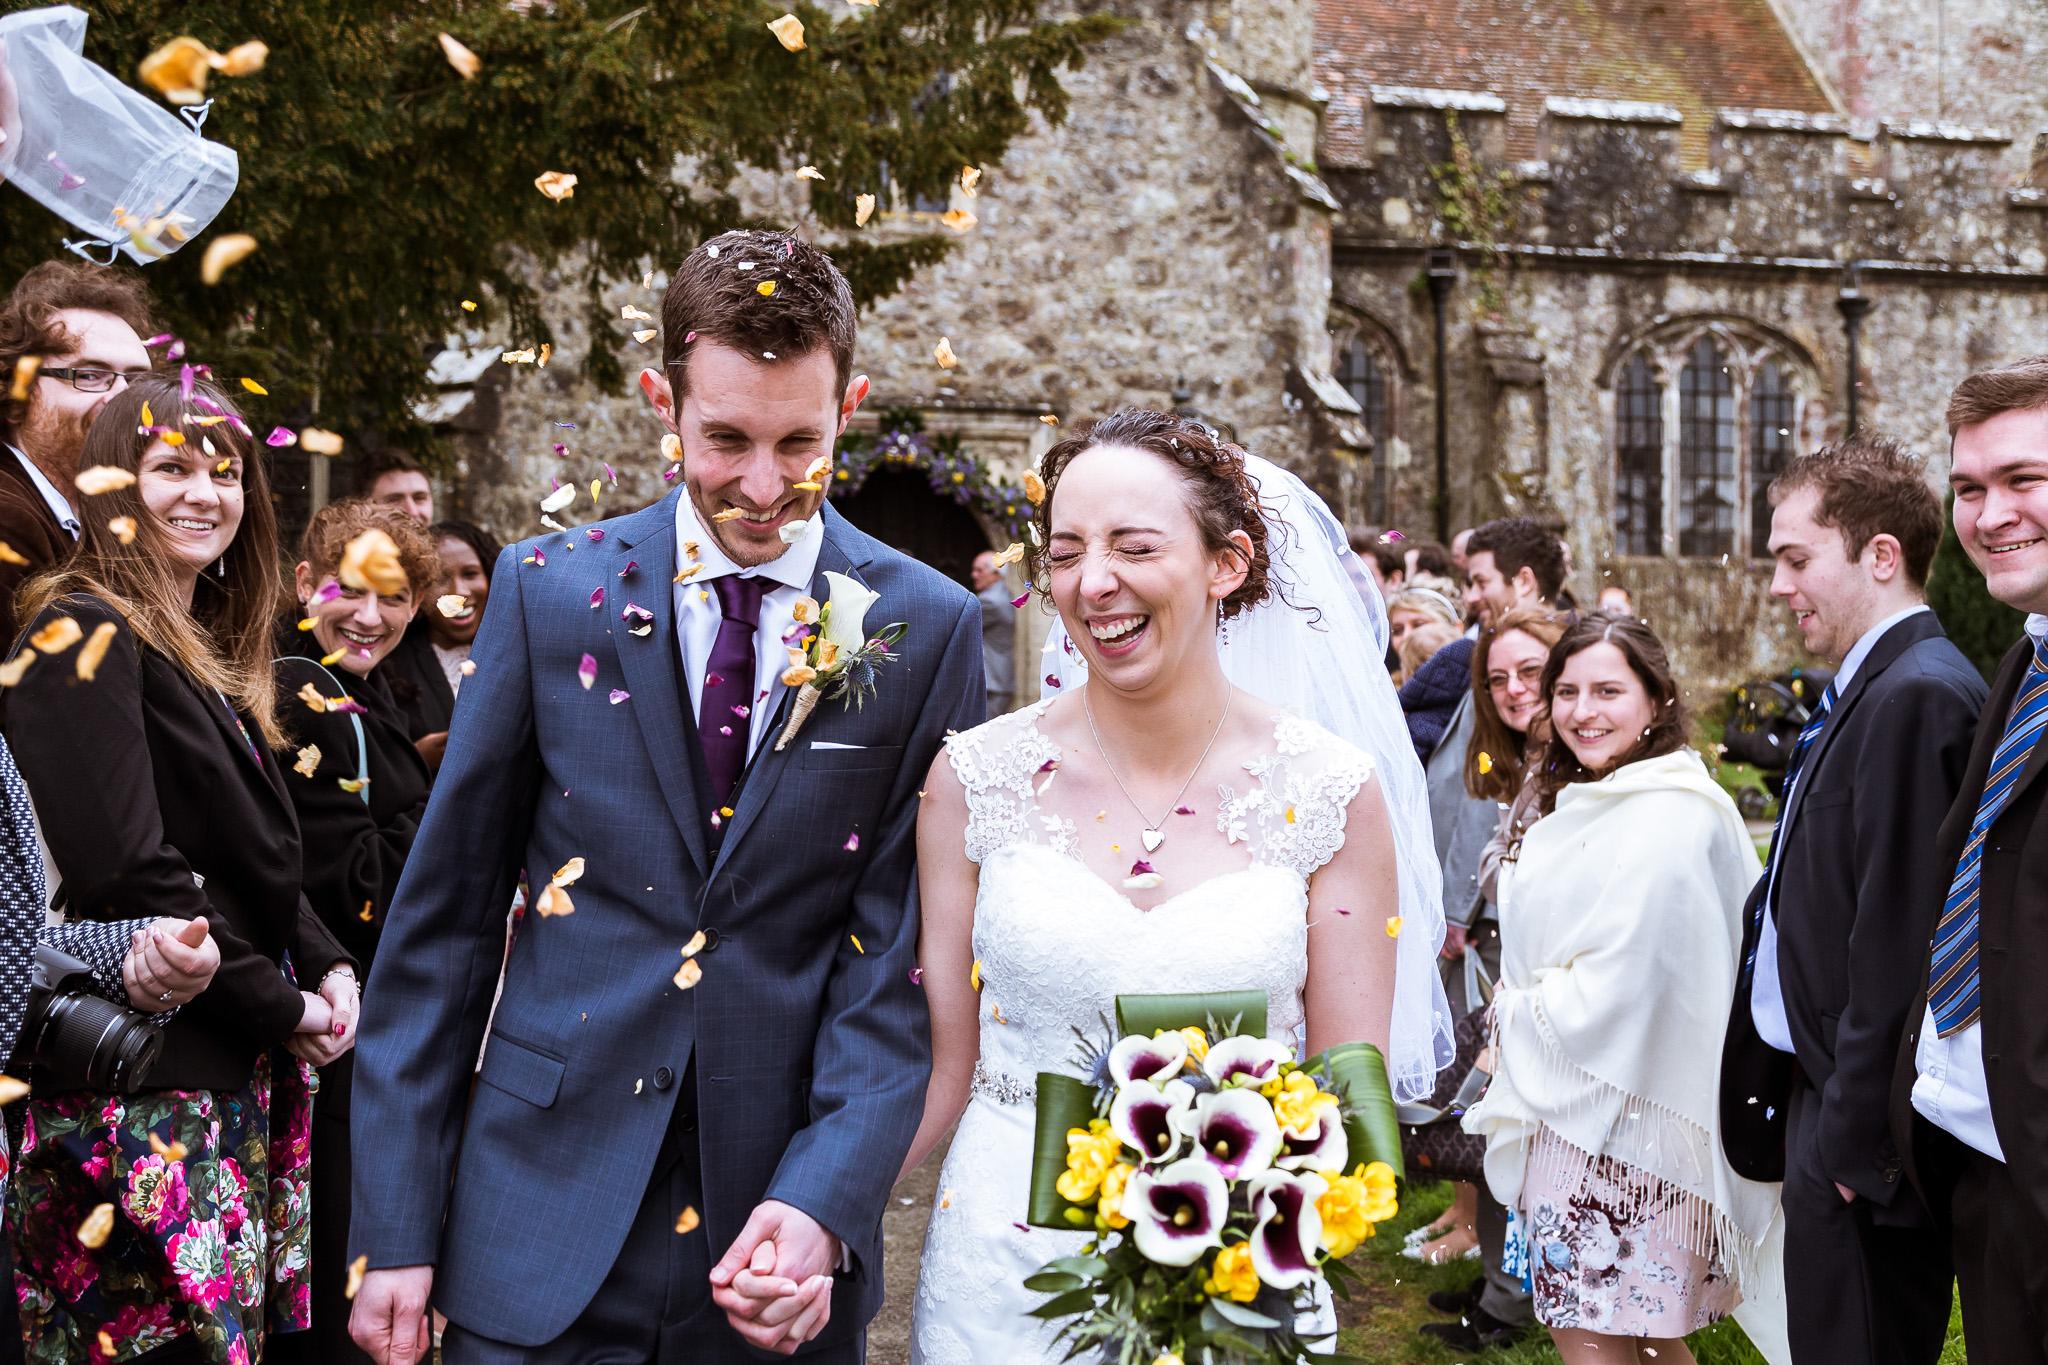 Kent Wedding - WoodChurch - Rob & Verity - Preview-12.jpg